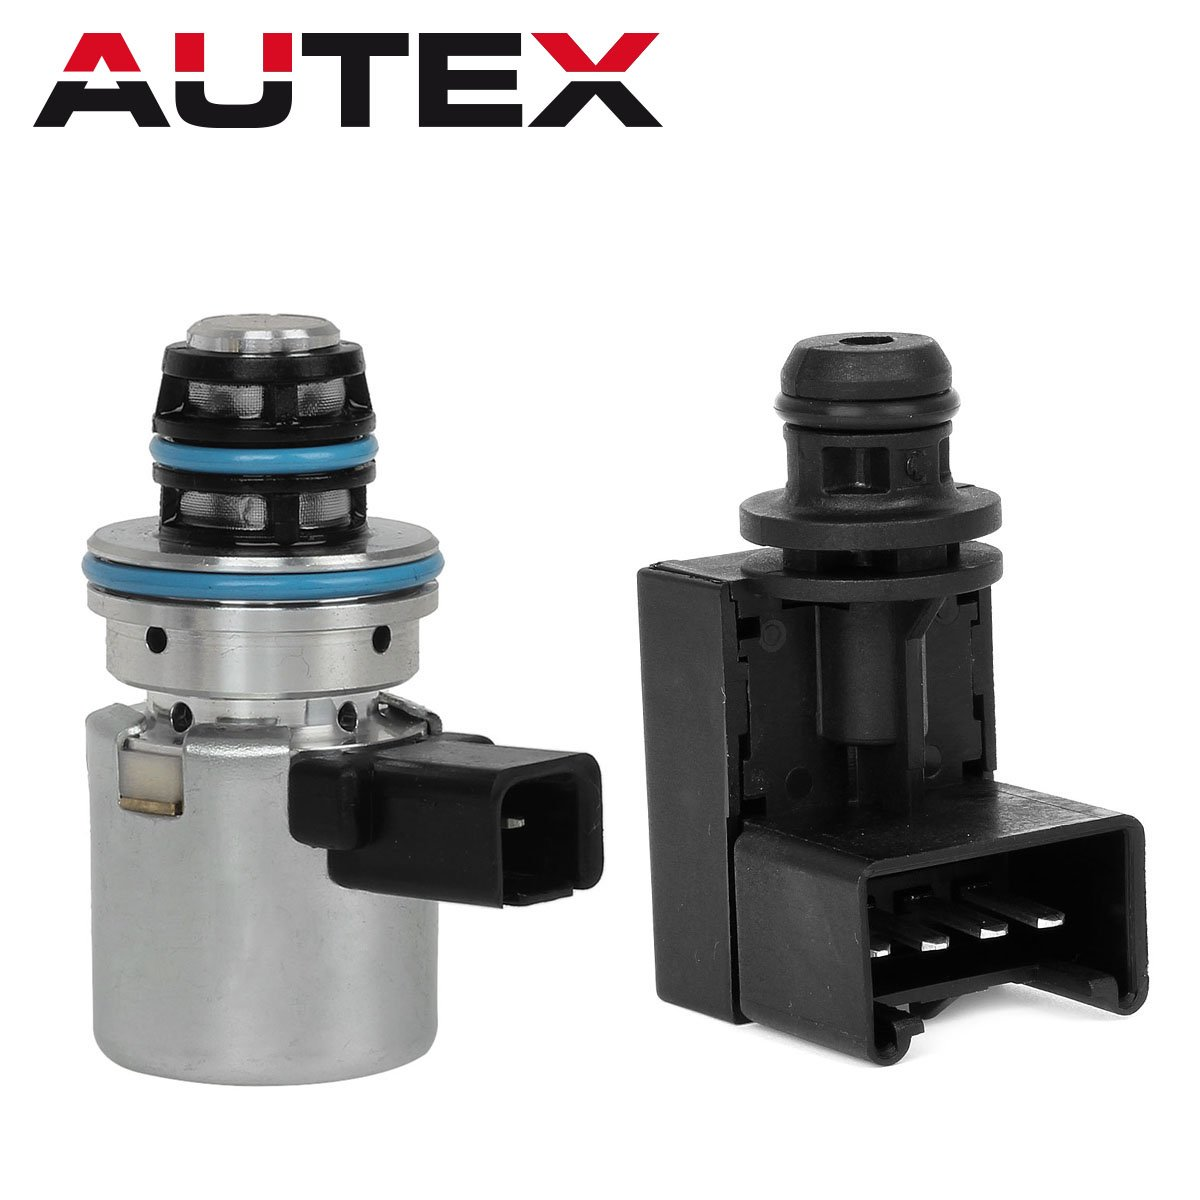 AUTEX A500 A518 46RE 47RE 46RH Governor Pressure Sensor Transducer & Solenoid Kit Compatible With 00 01 02 03 04 Jeep Grand Cherokee/00 01 02 03 Dodge Dakota Dodge Durango/Dodge Ram 1500,2500,3500